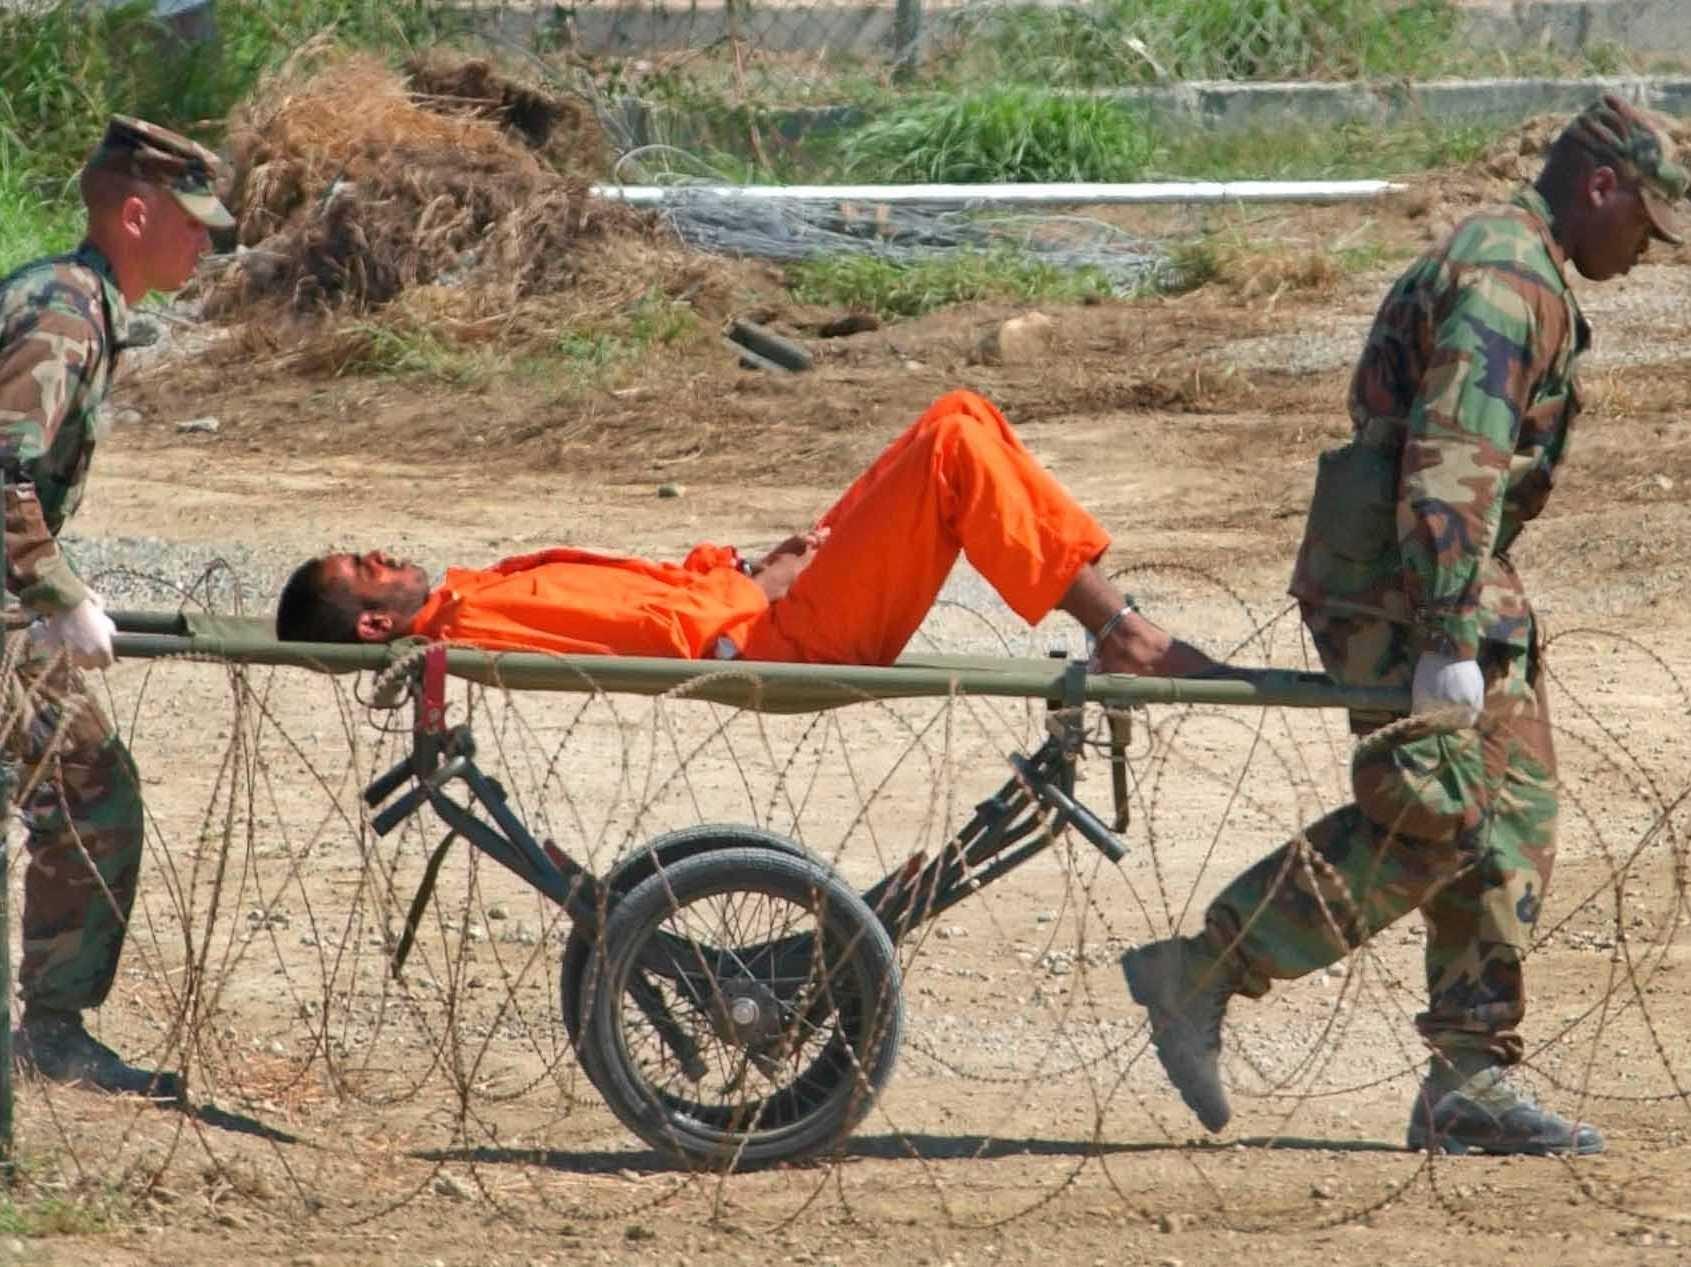 guantanamo-detainee